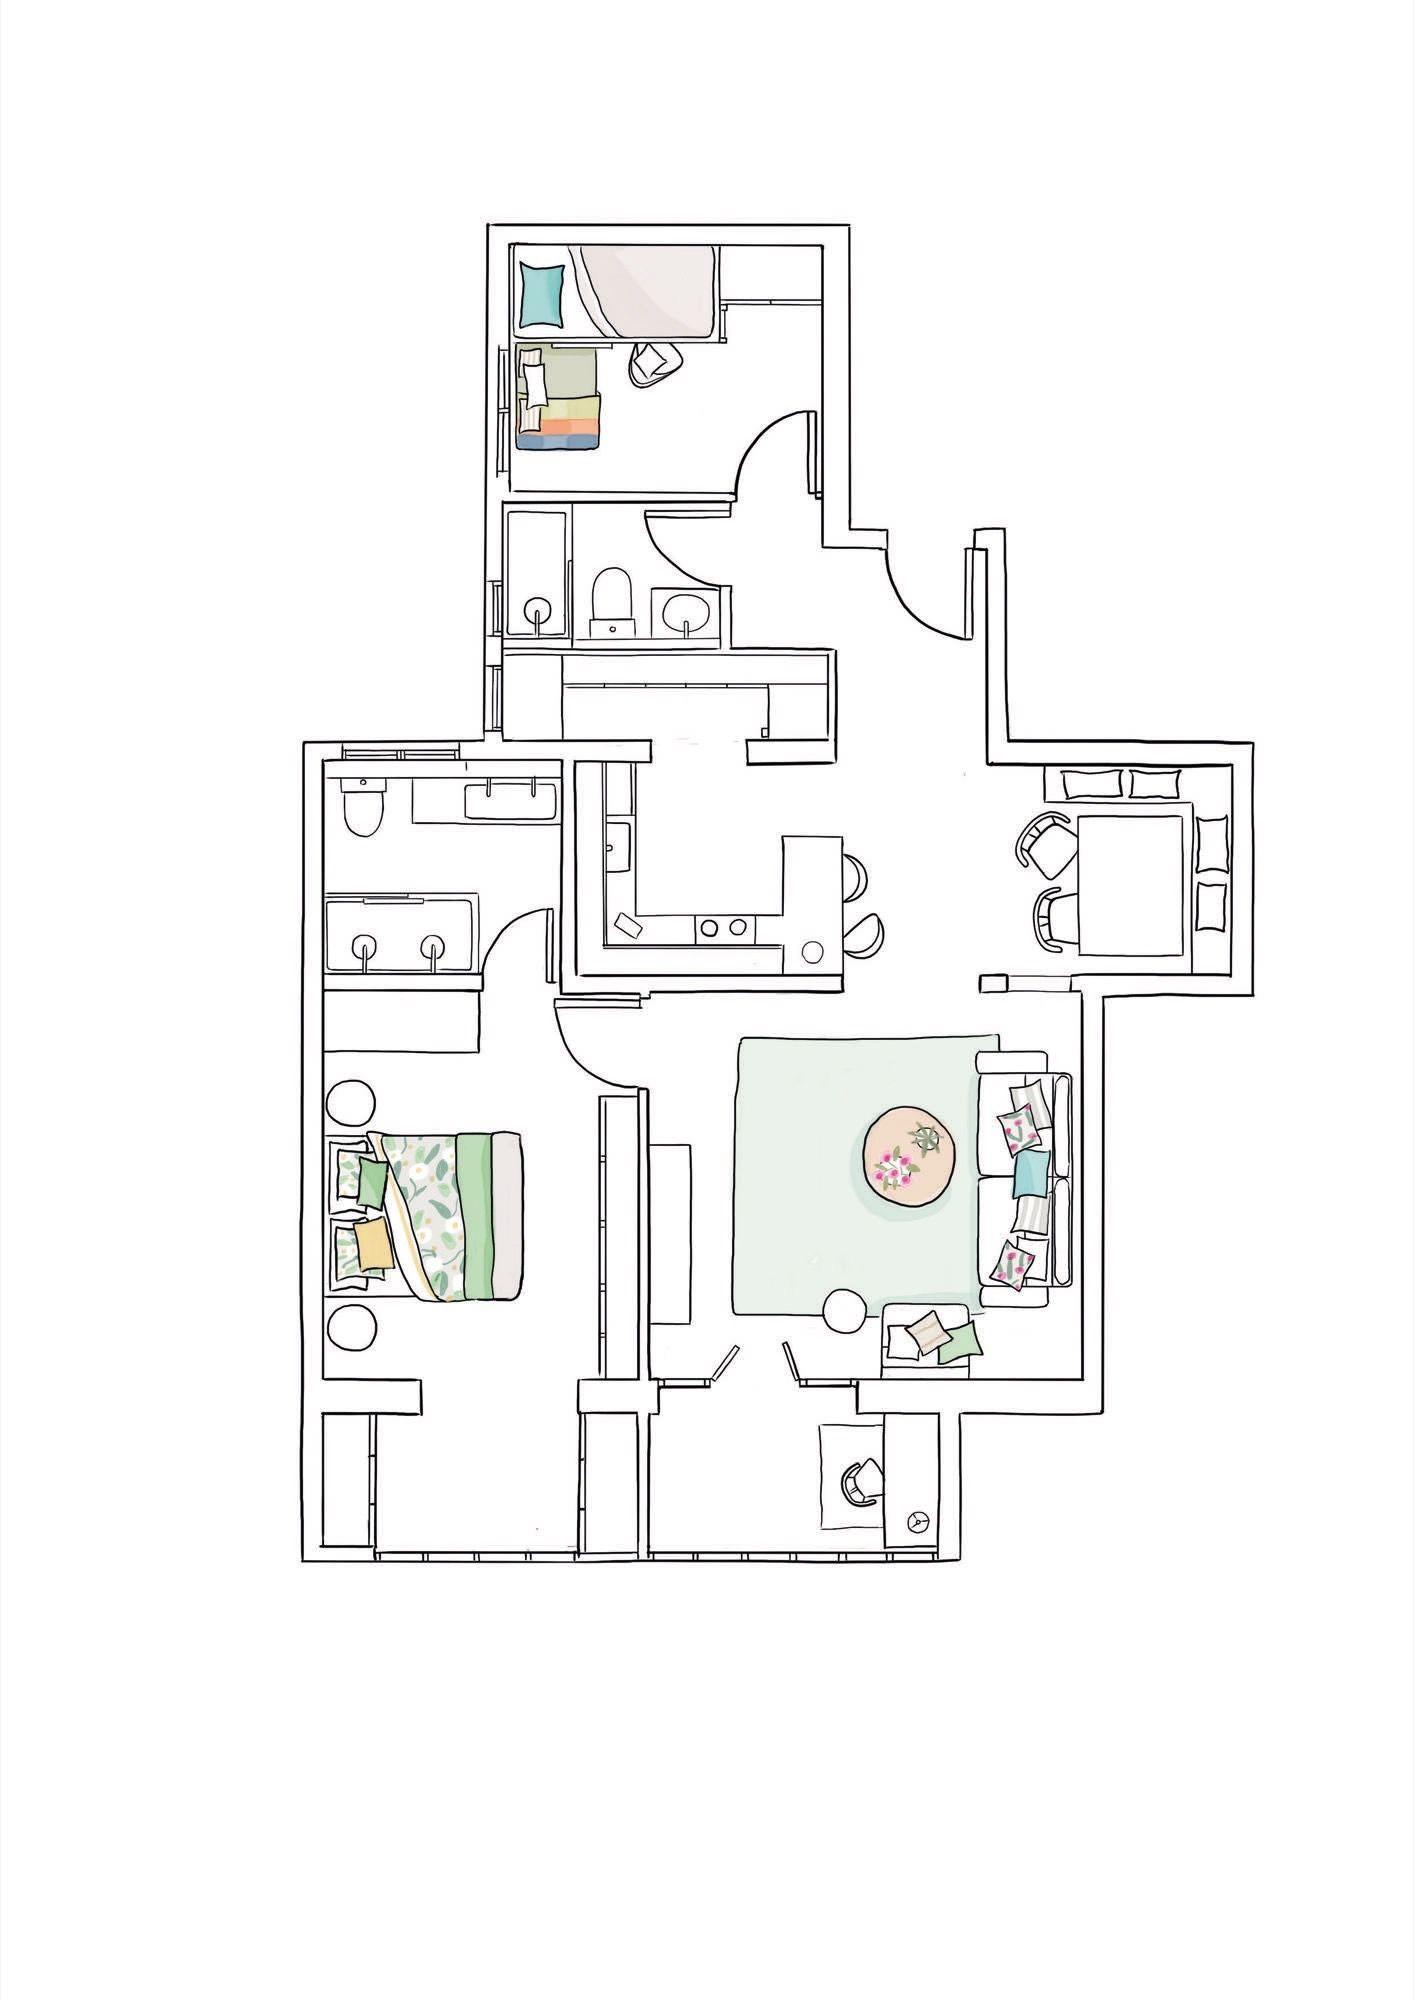 80 metros muy aprovechados proyectos arquitect nicos for Diseno de apartamento de 4x8 mts